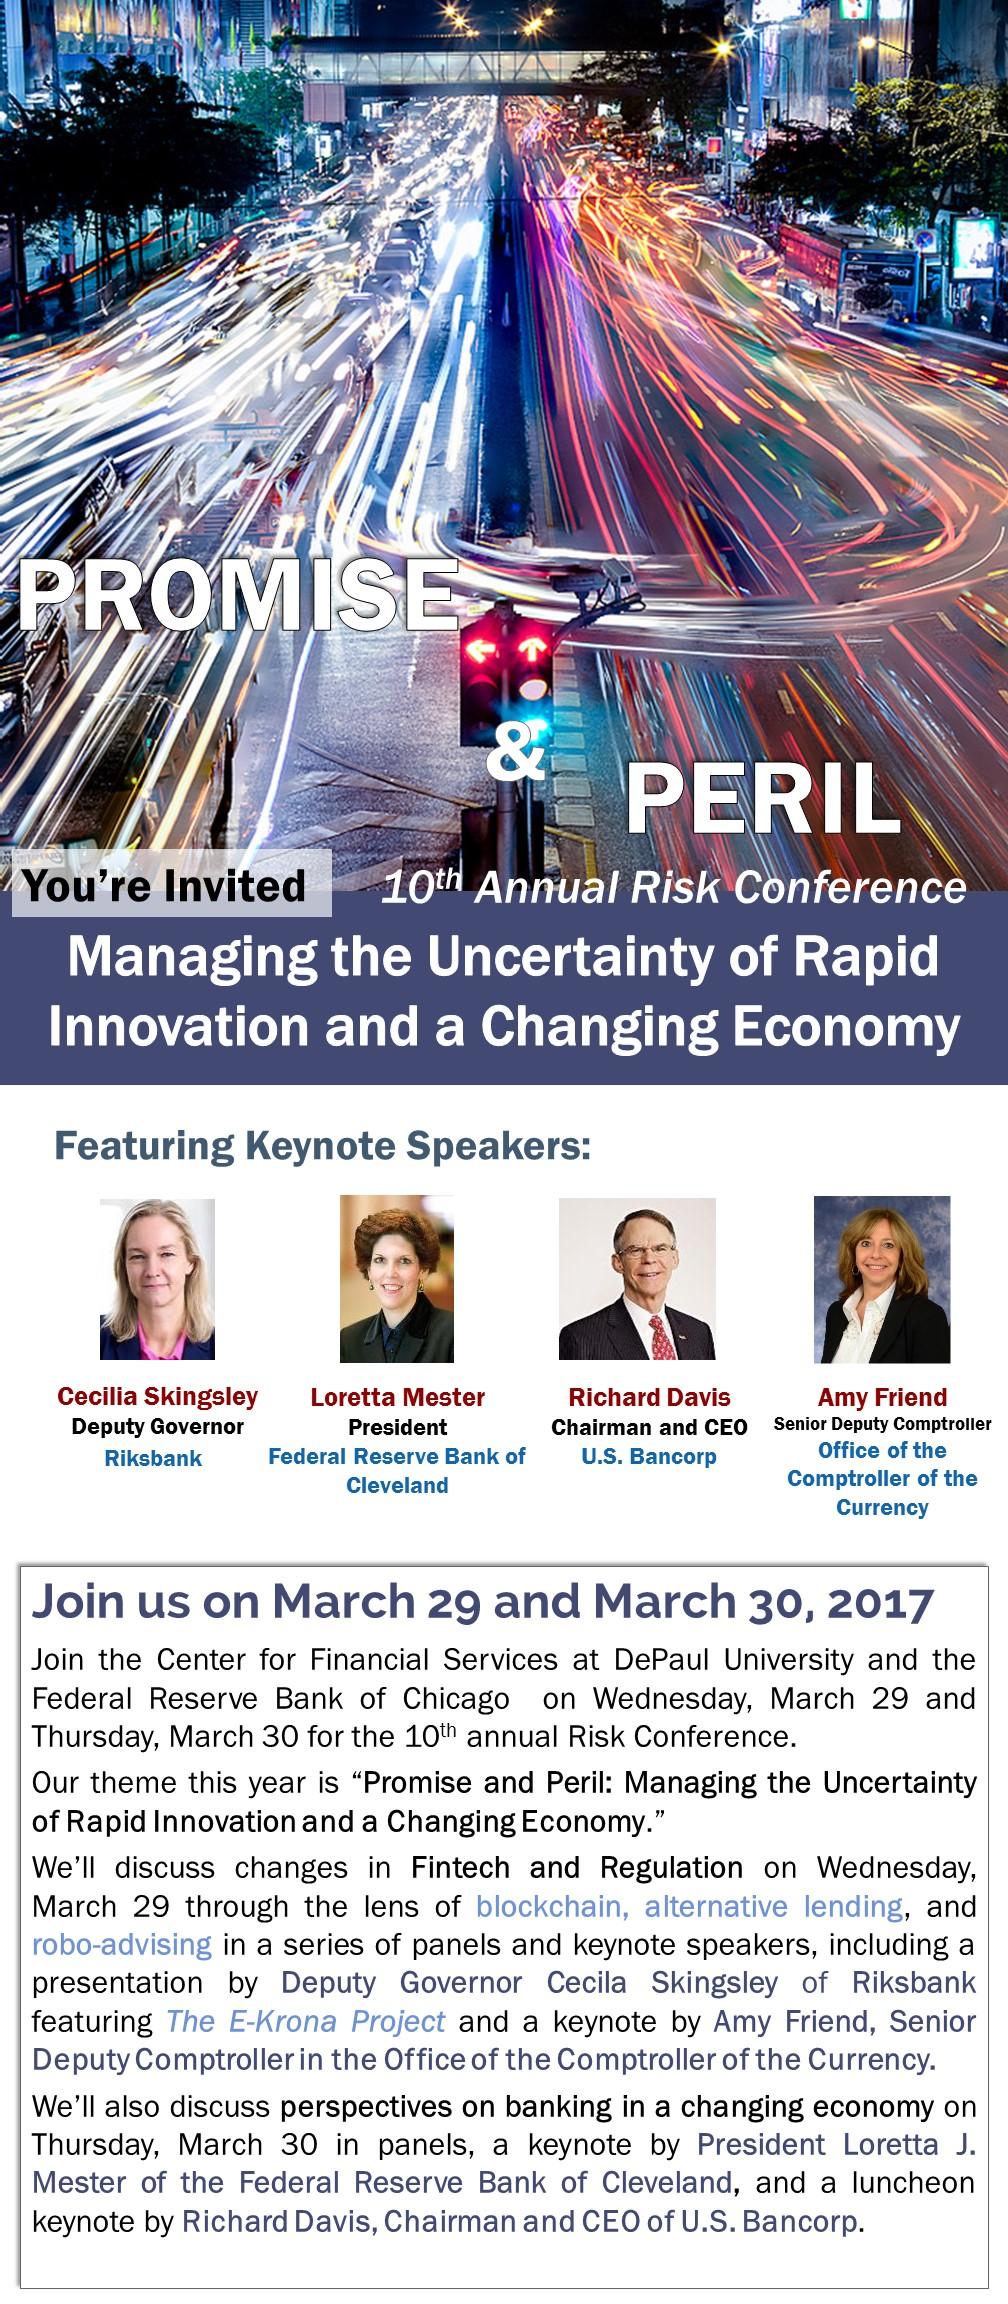 Promise and Peril Conference Description